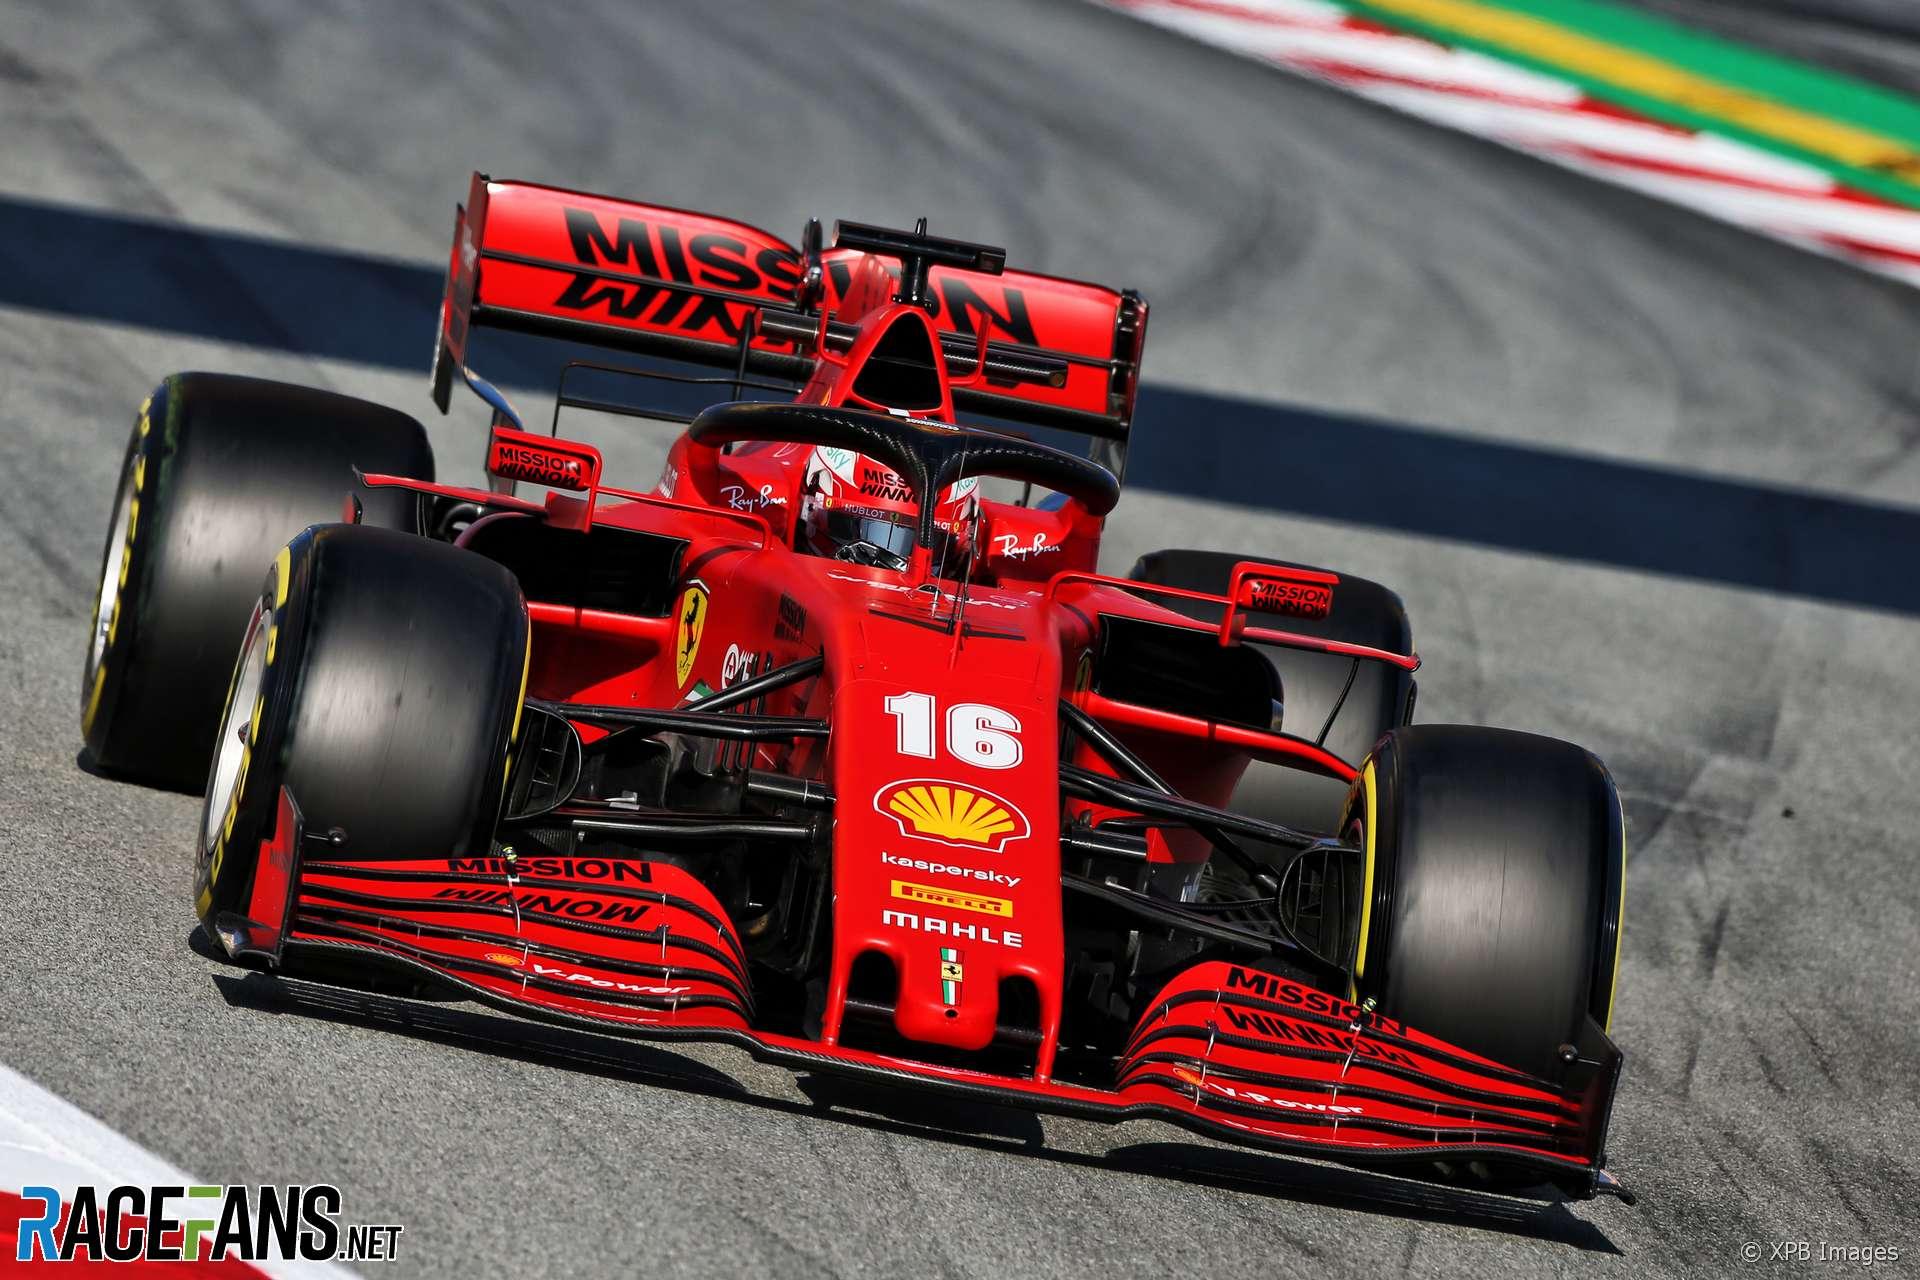 Charles Leclerc, Ferrari, Circuit de Catalunya, 2020 ...